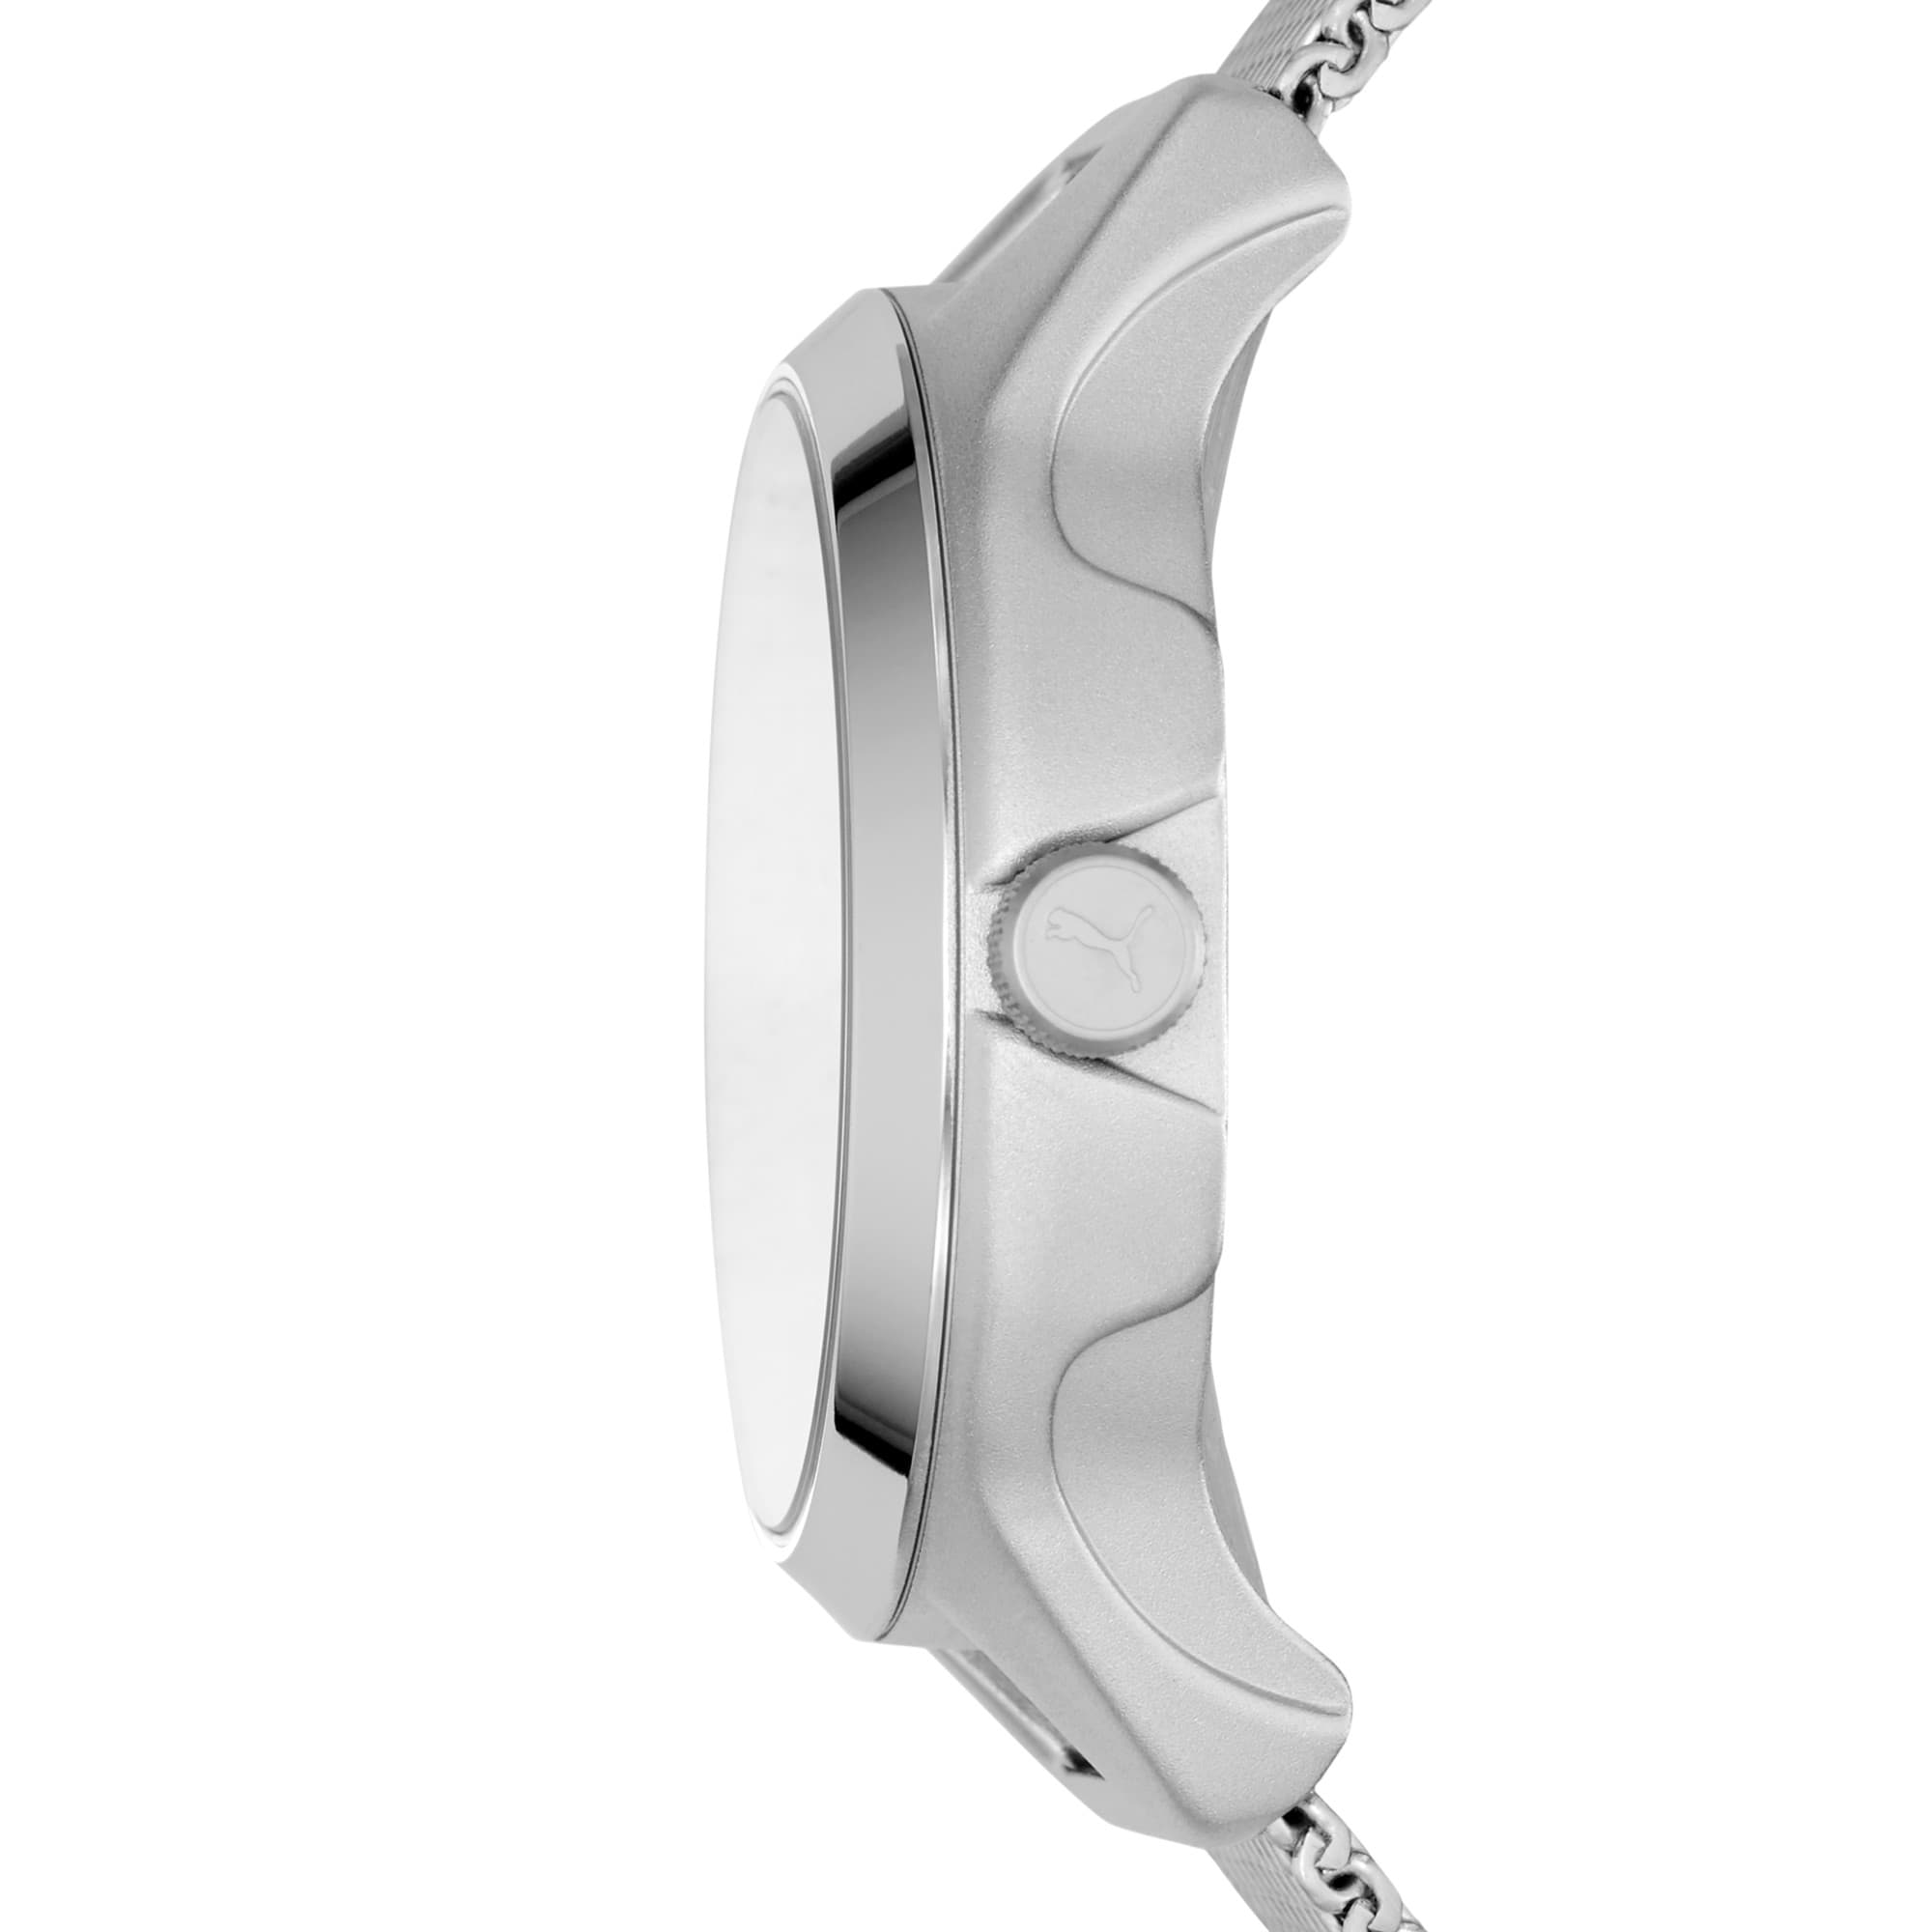 Thumbnail 4 of Reset v1 Watch, Silver/Silver, medium